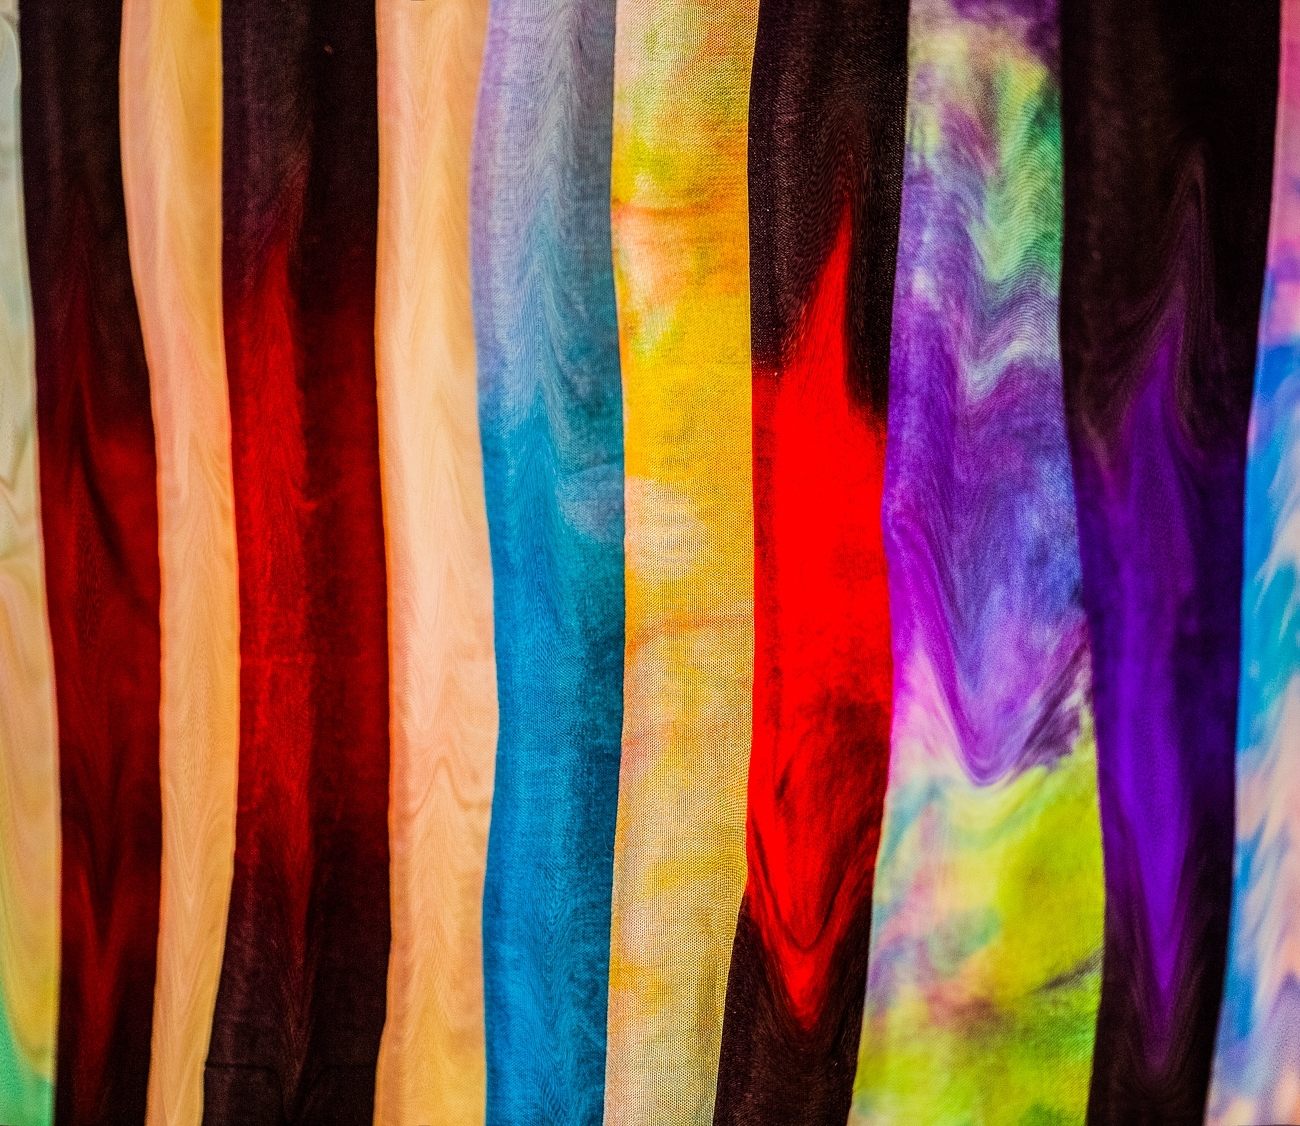 'Silk' (PB 1 Place) by Dana Christensen - MR